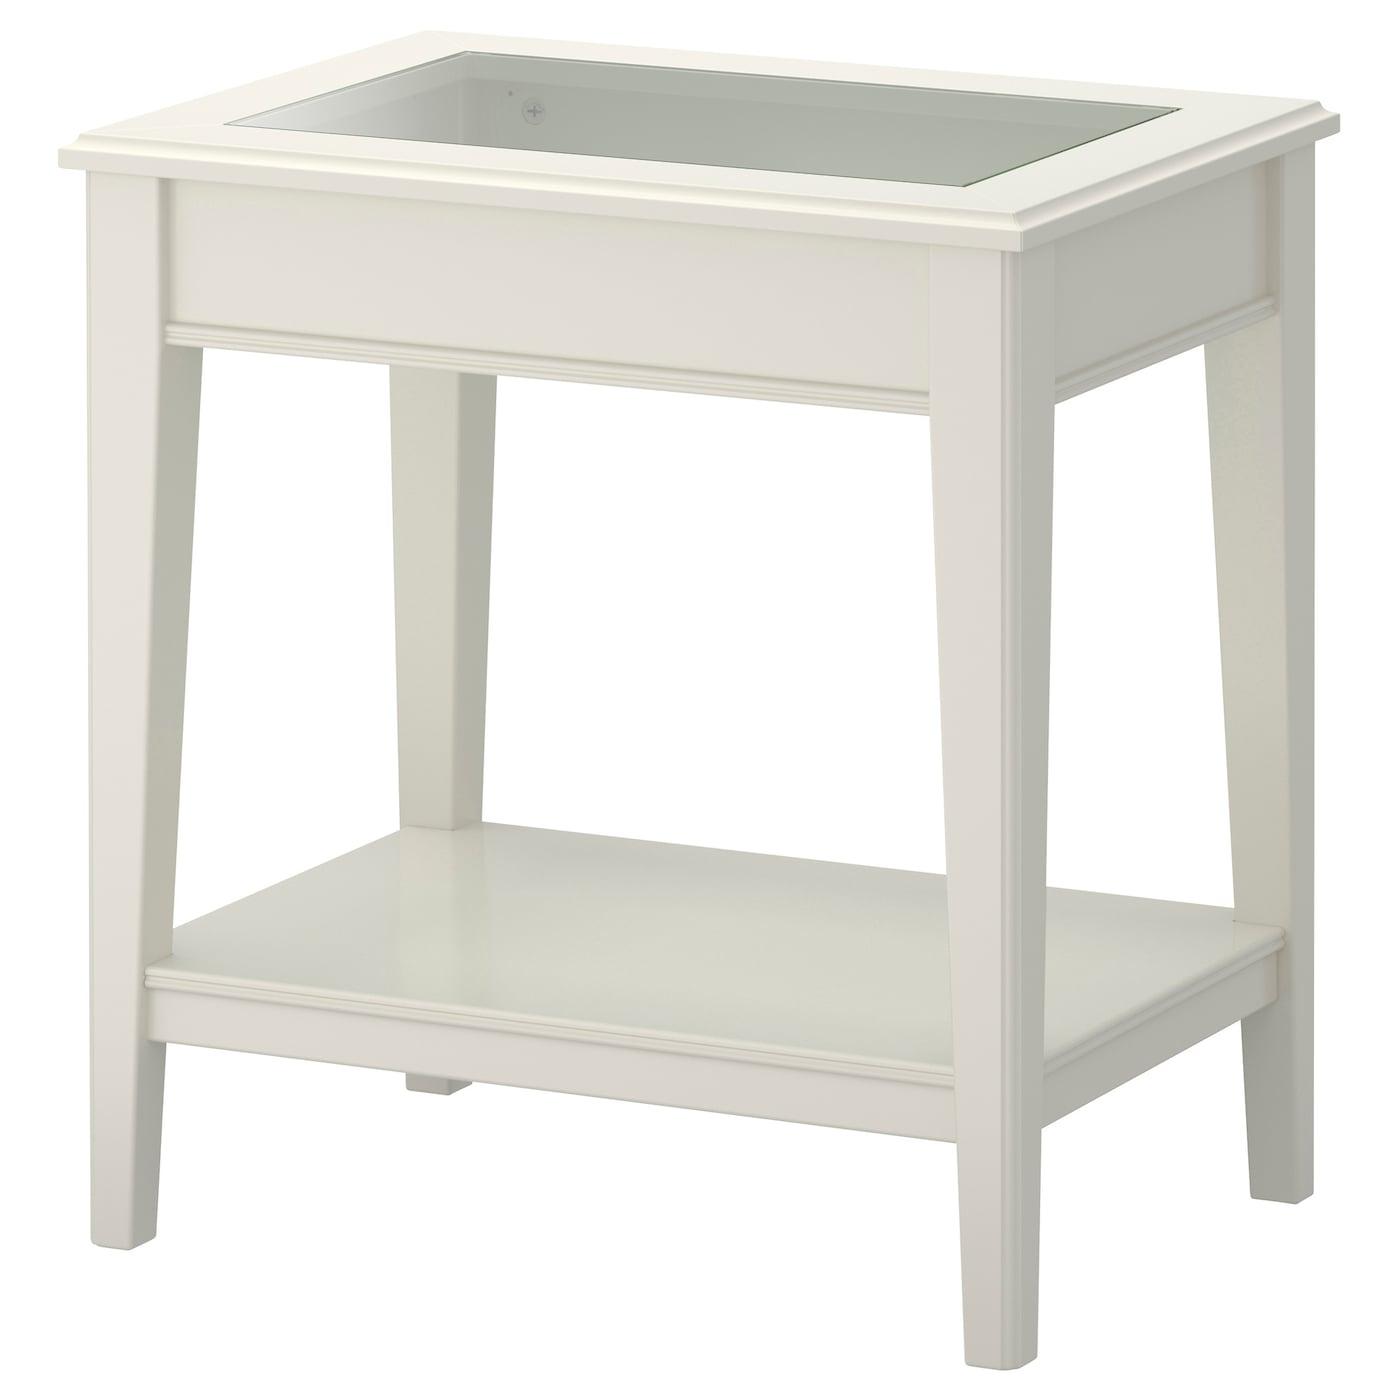 Ikea Bijzettafel Op Wieltjes.Bijzettafels Landelijk Houten Zwart Wit Glazen Design